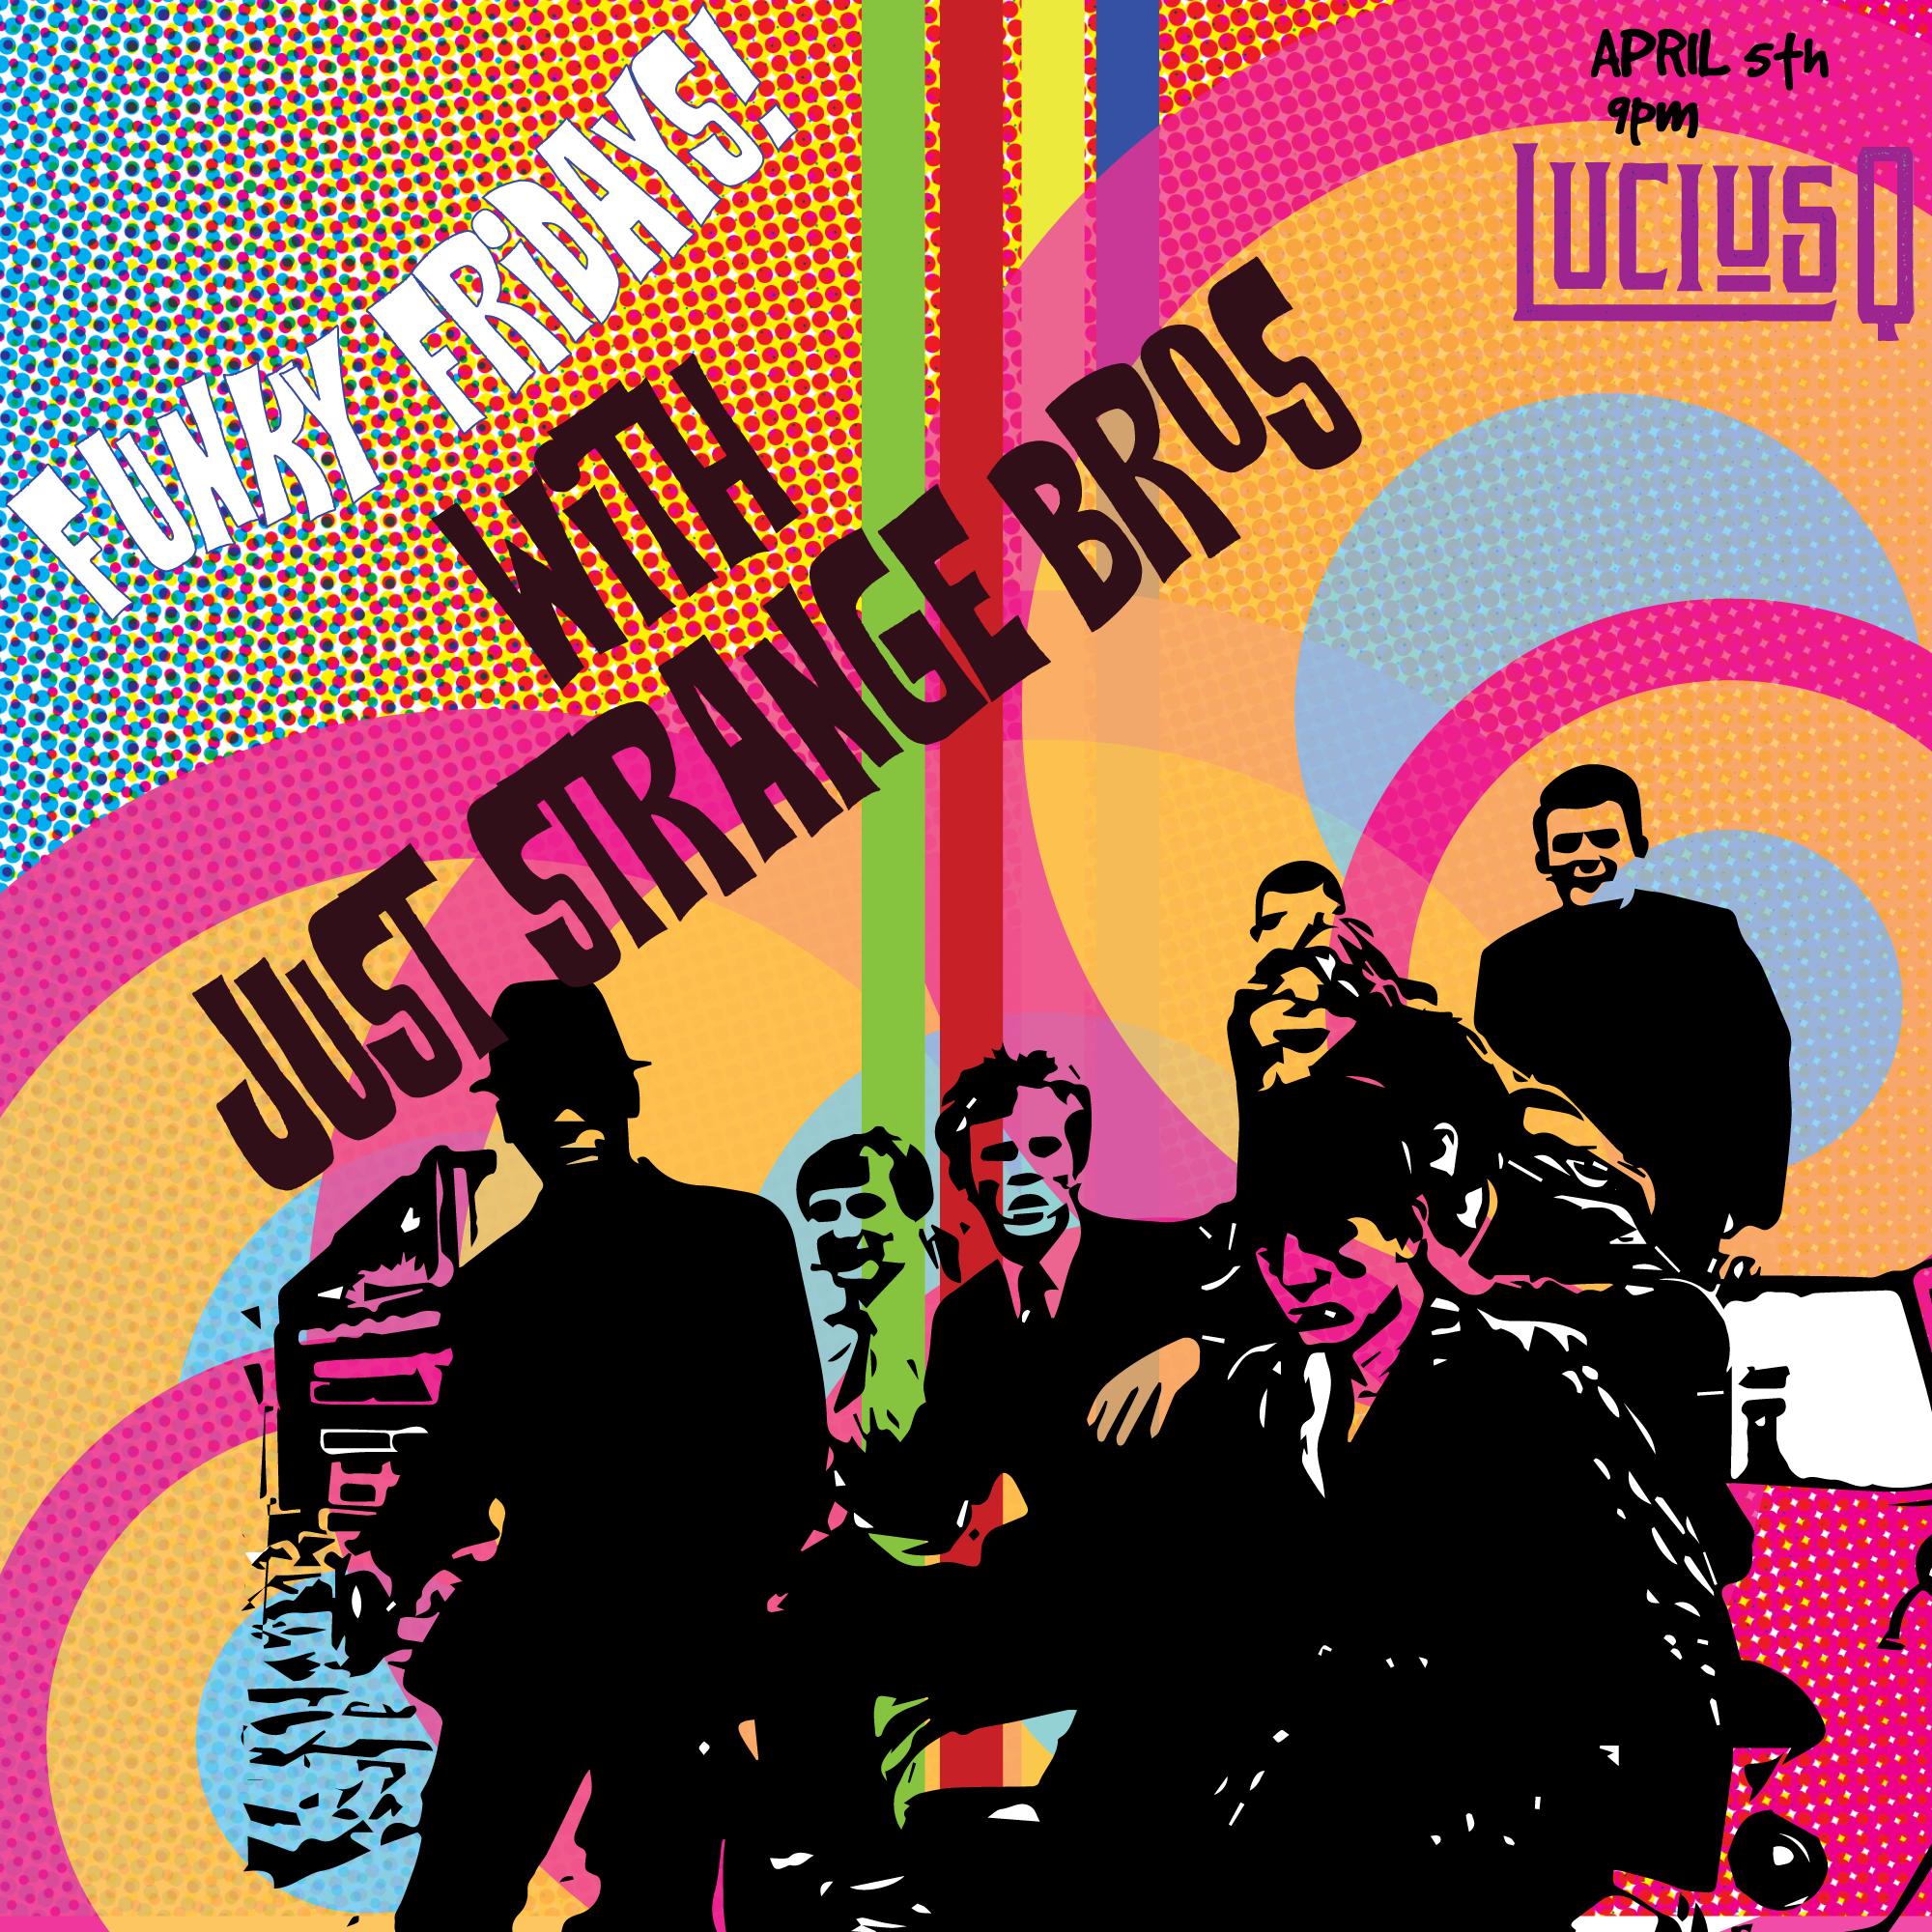 FiR-Creative---LuciusQ---Just-Strange-Bros.png